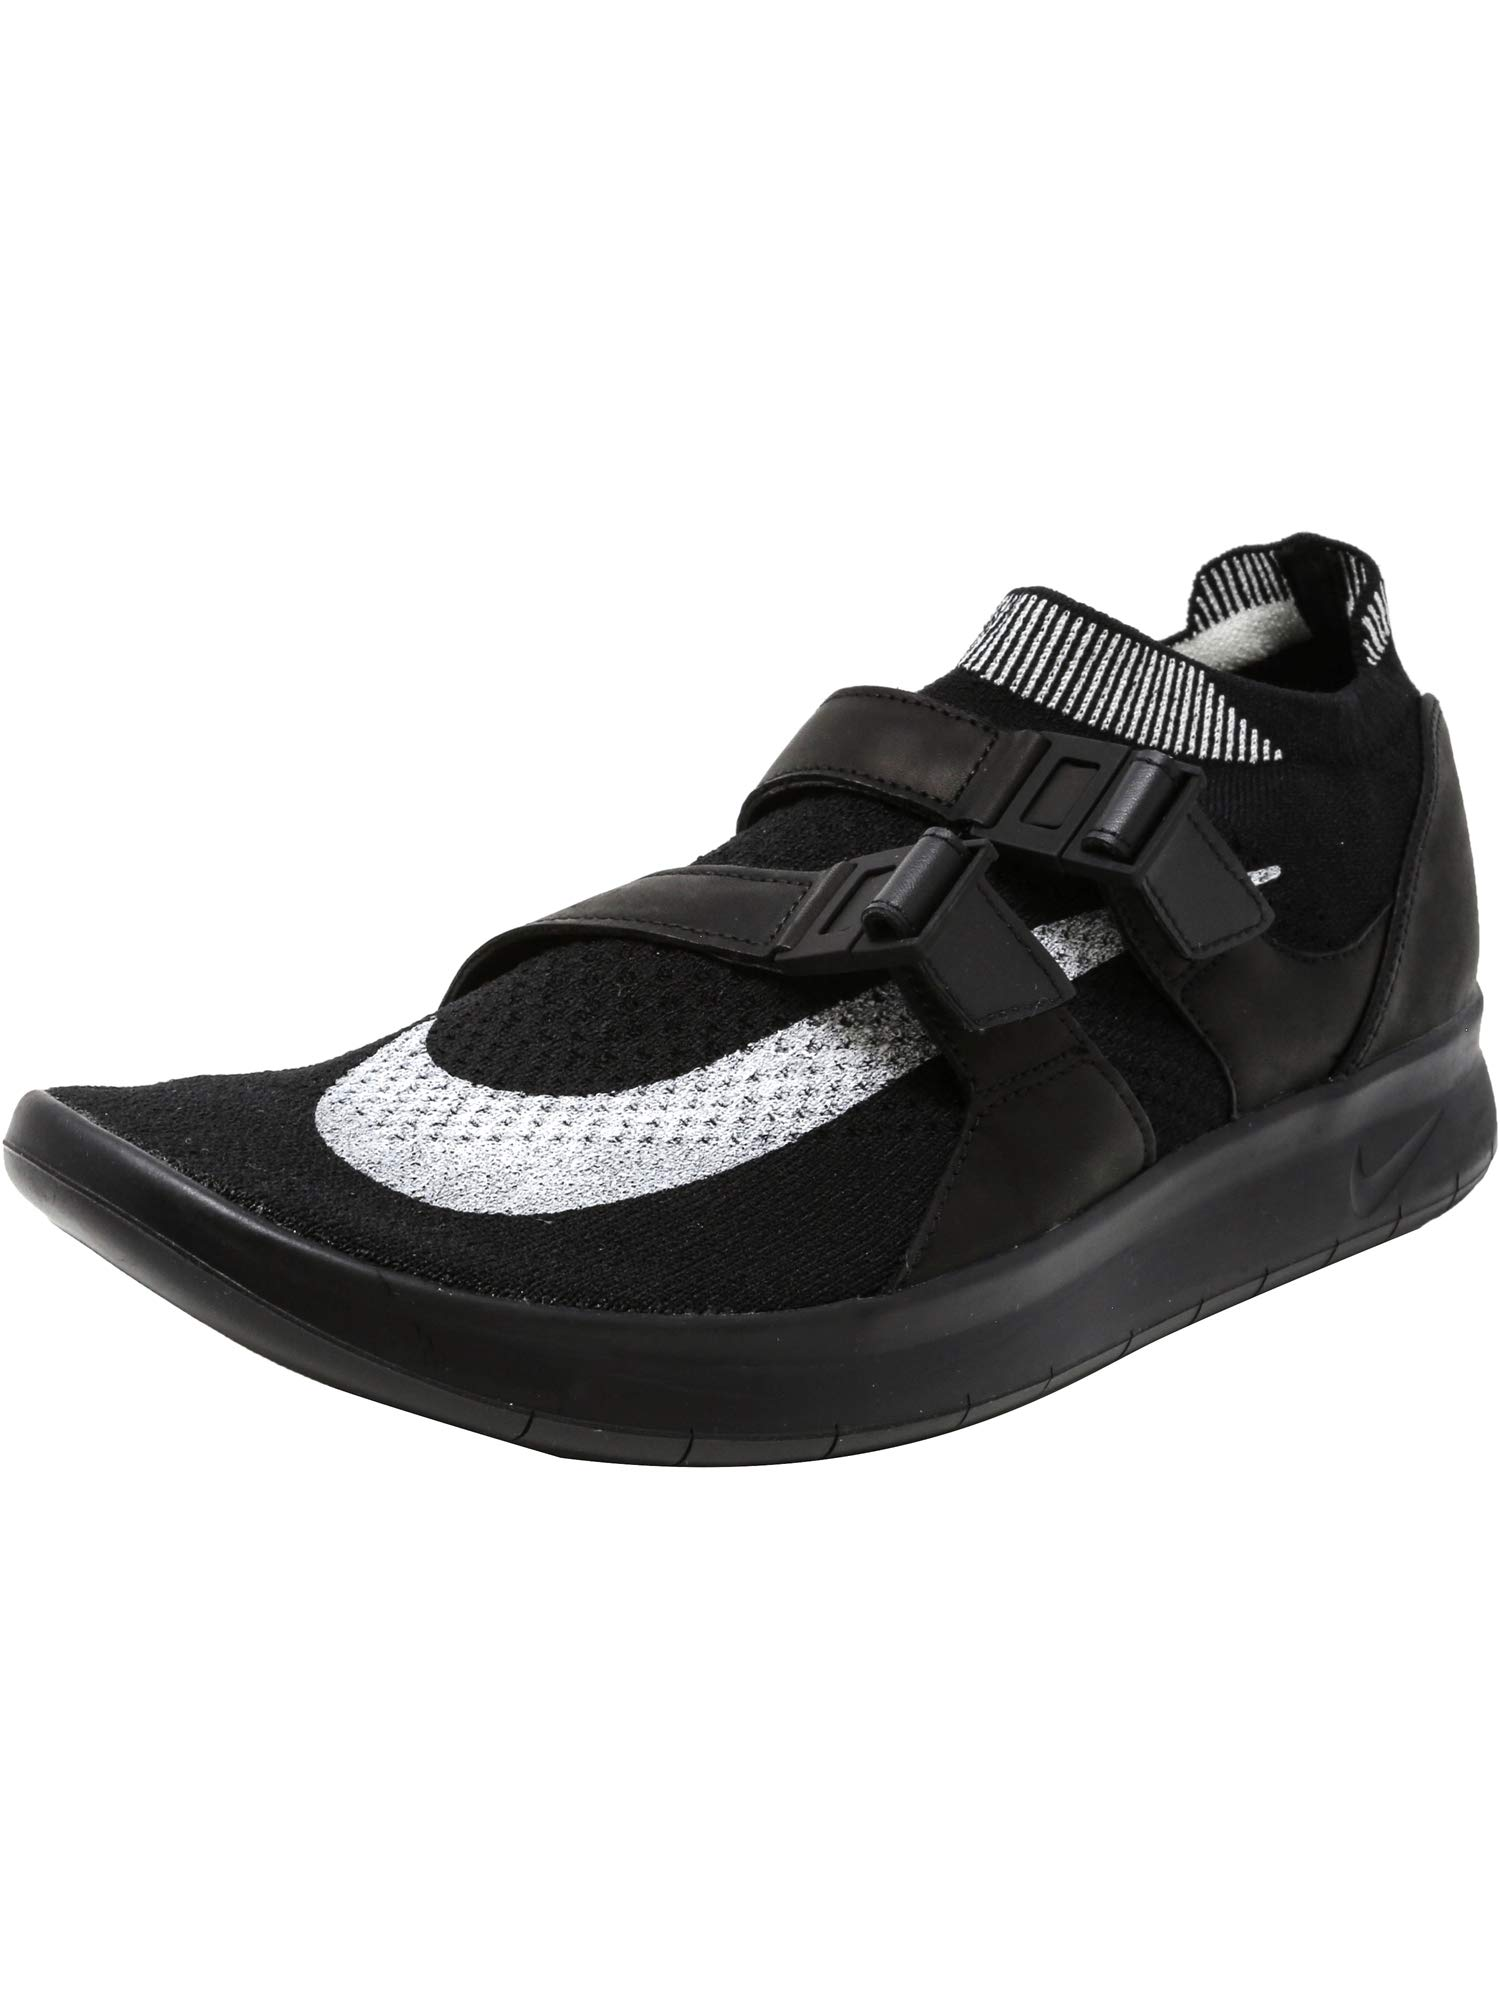 Shoe Black Men's Air Nike Ankle High Running 10m Flyknit Blacksail Sockracer wn0PXk8O